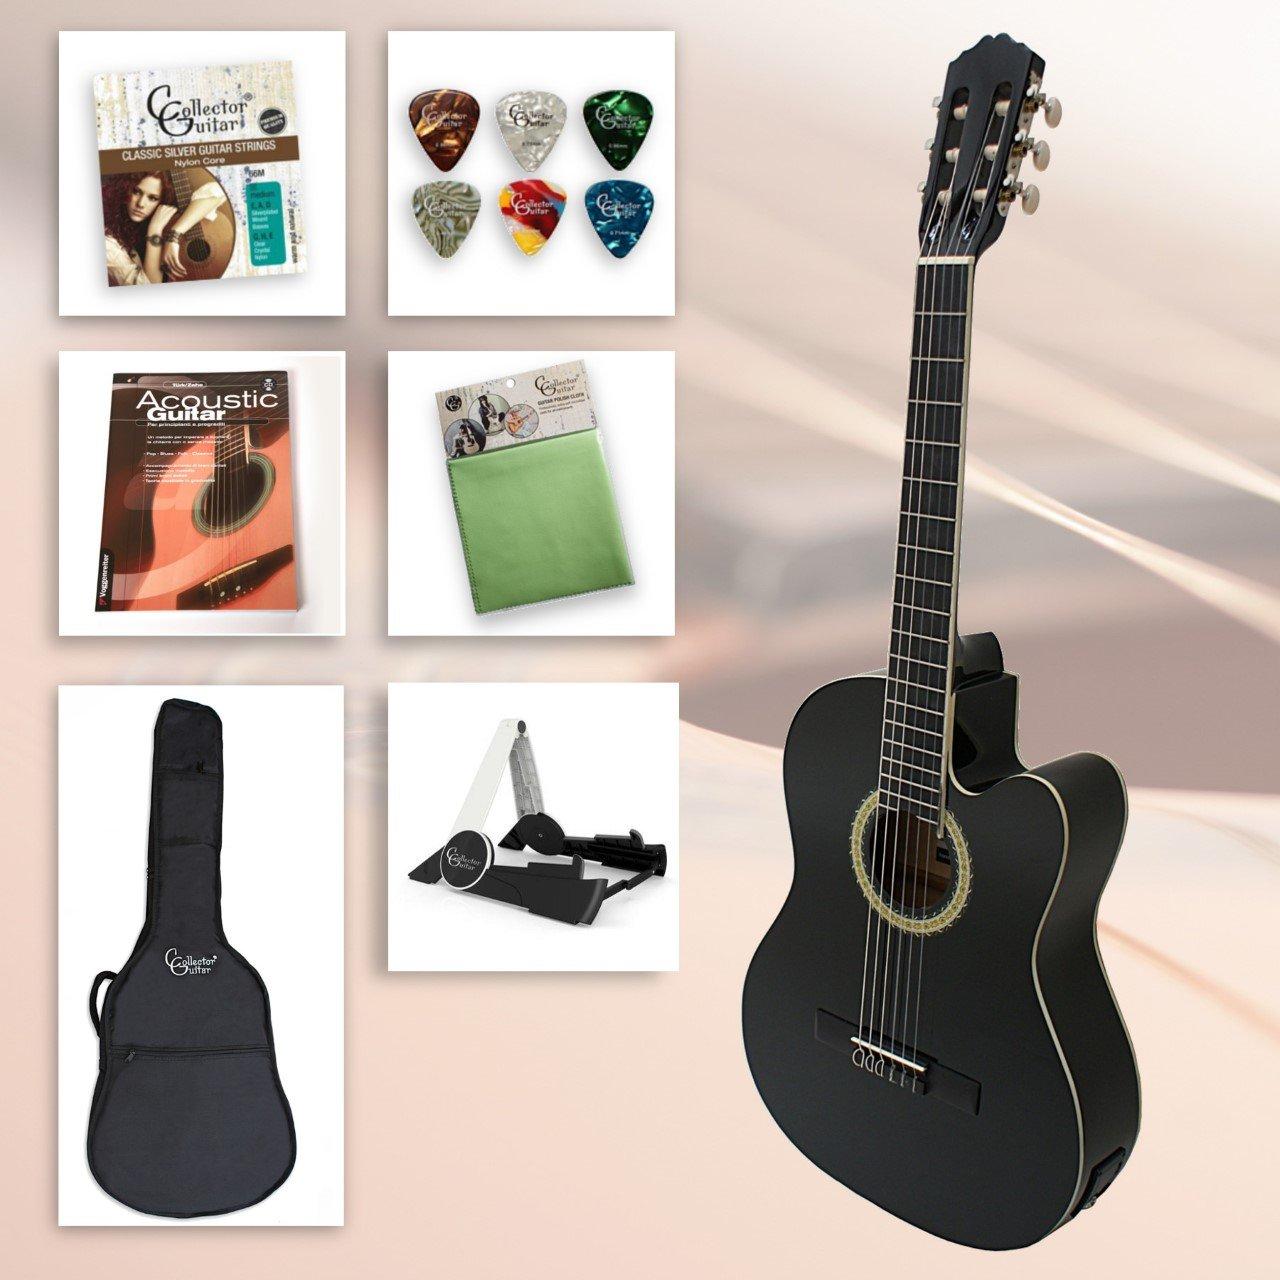 Set de guitarra de principiantes Black Kiss - 4/4 Guitarra Negro eléctrico de concierto con accesorios, soporte para guitarra, guitarra con forro funda, ...